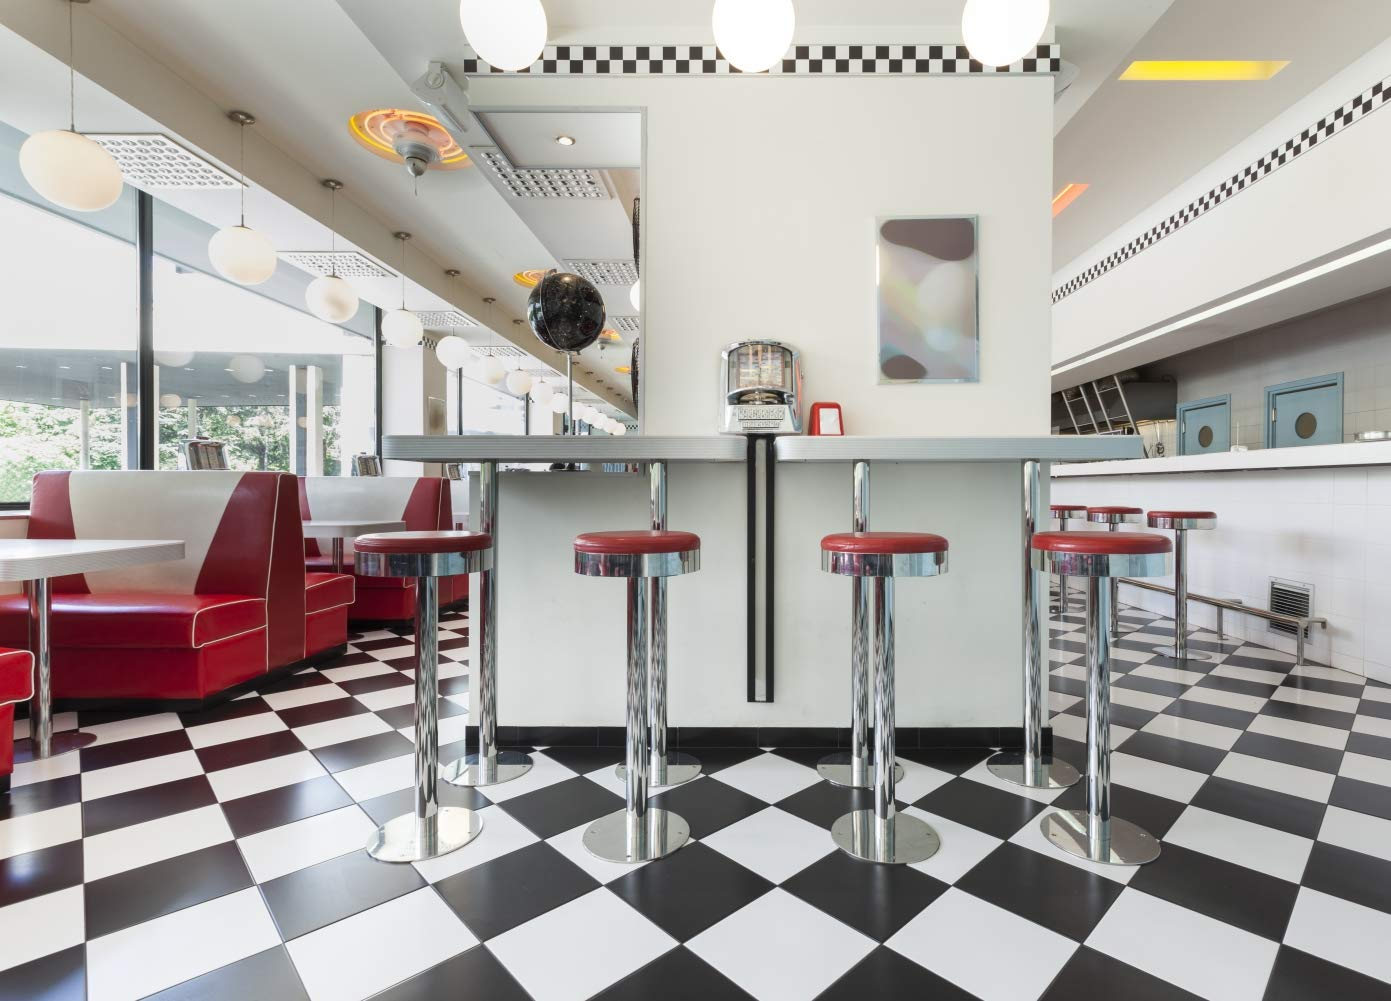 Amazoncom Gardenia 8x6ft Vintage 1950s Diner Restaurant